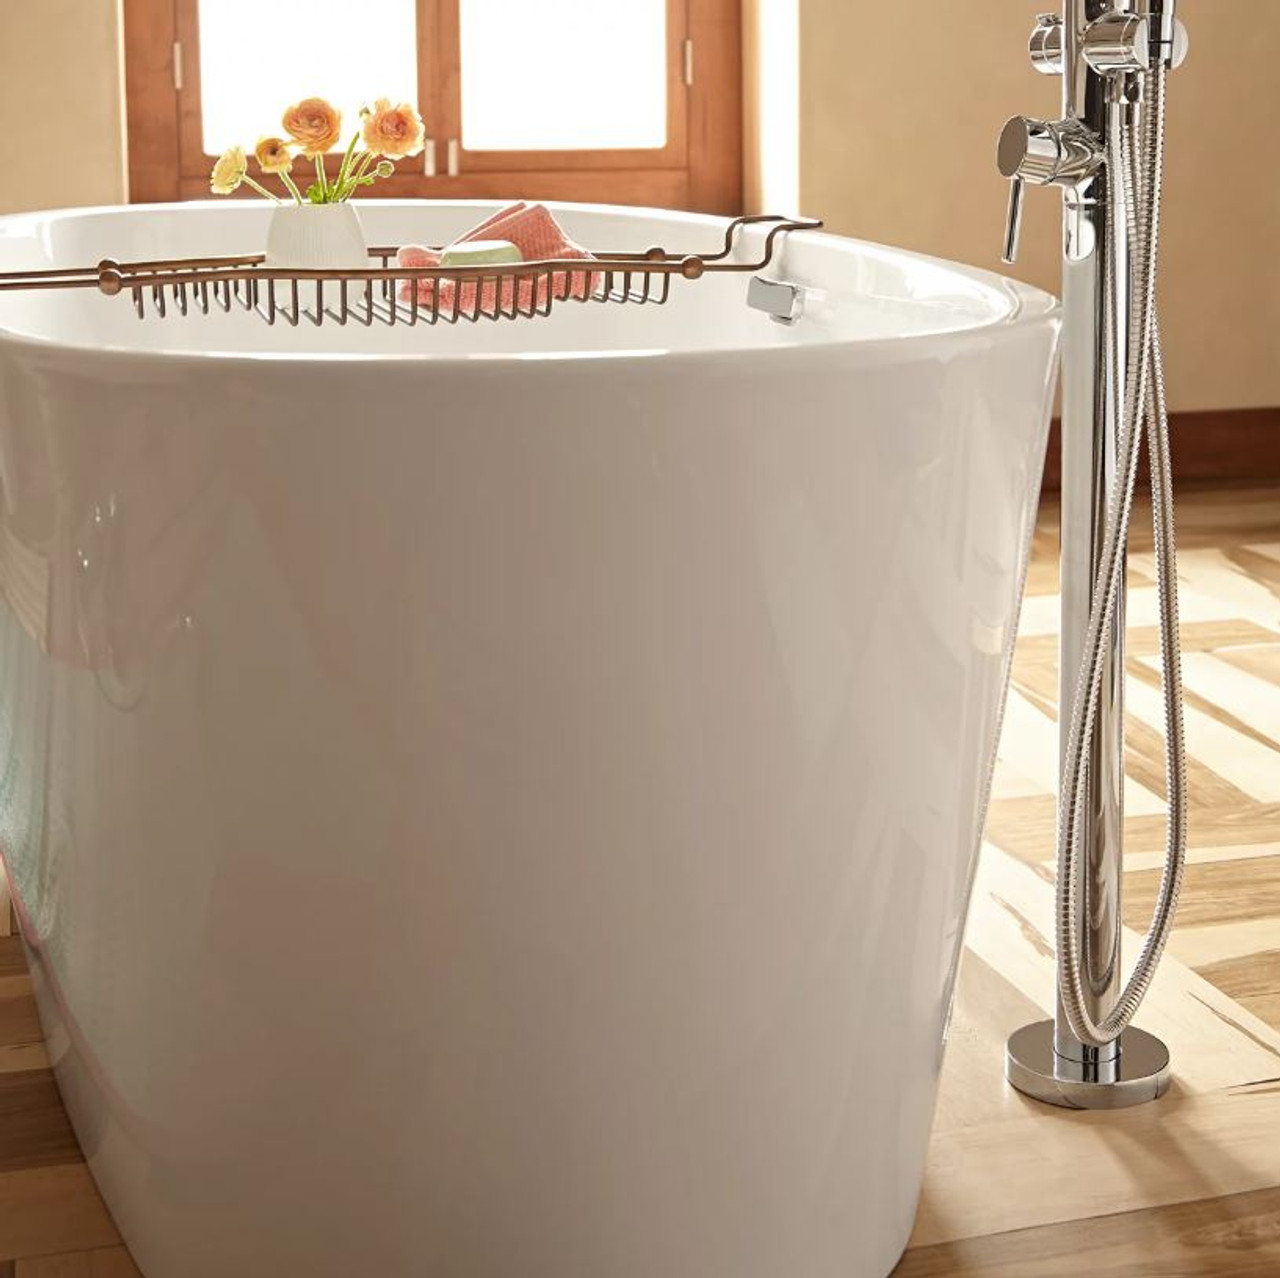 American Standard Coastal Serin 68 3 4 Acrylic Free Standing Soaking Bathtub With Center Drain Royal Bath Place